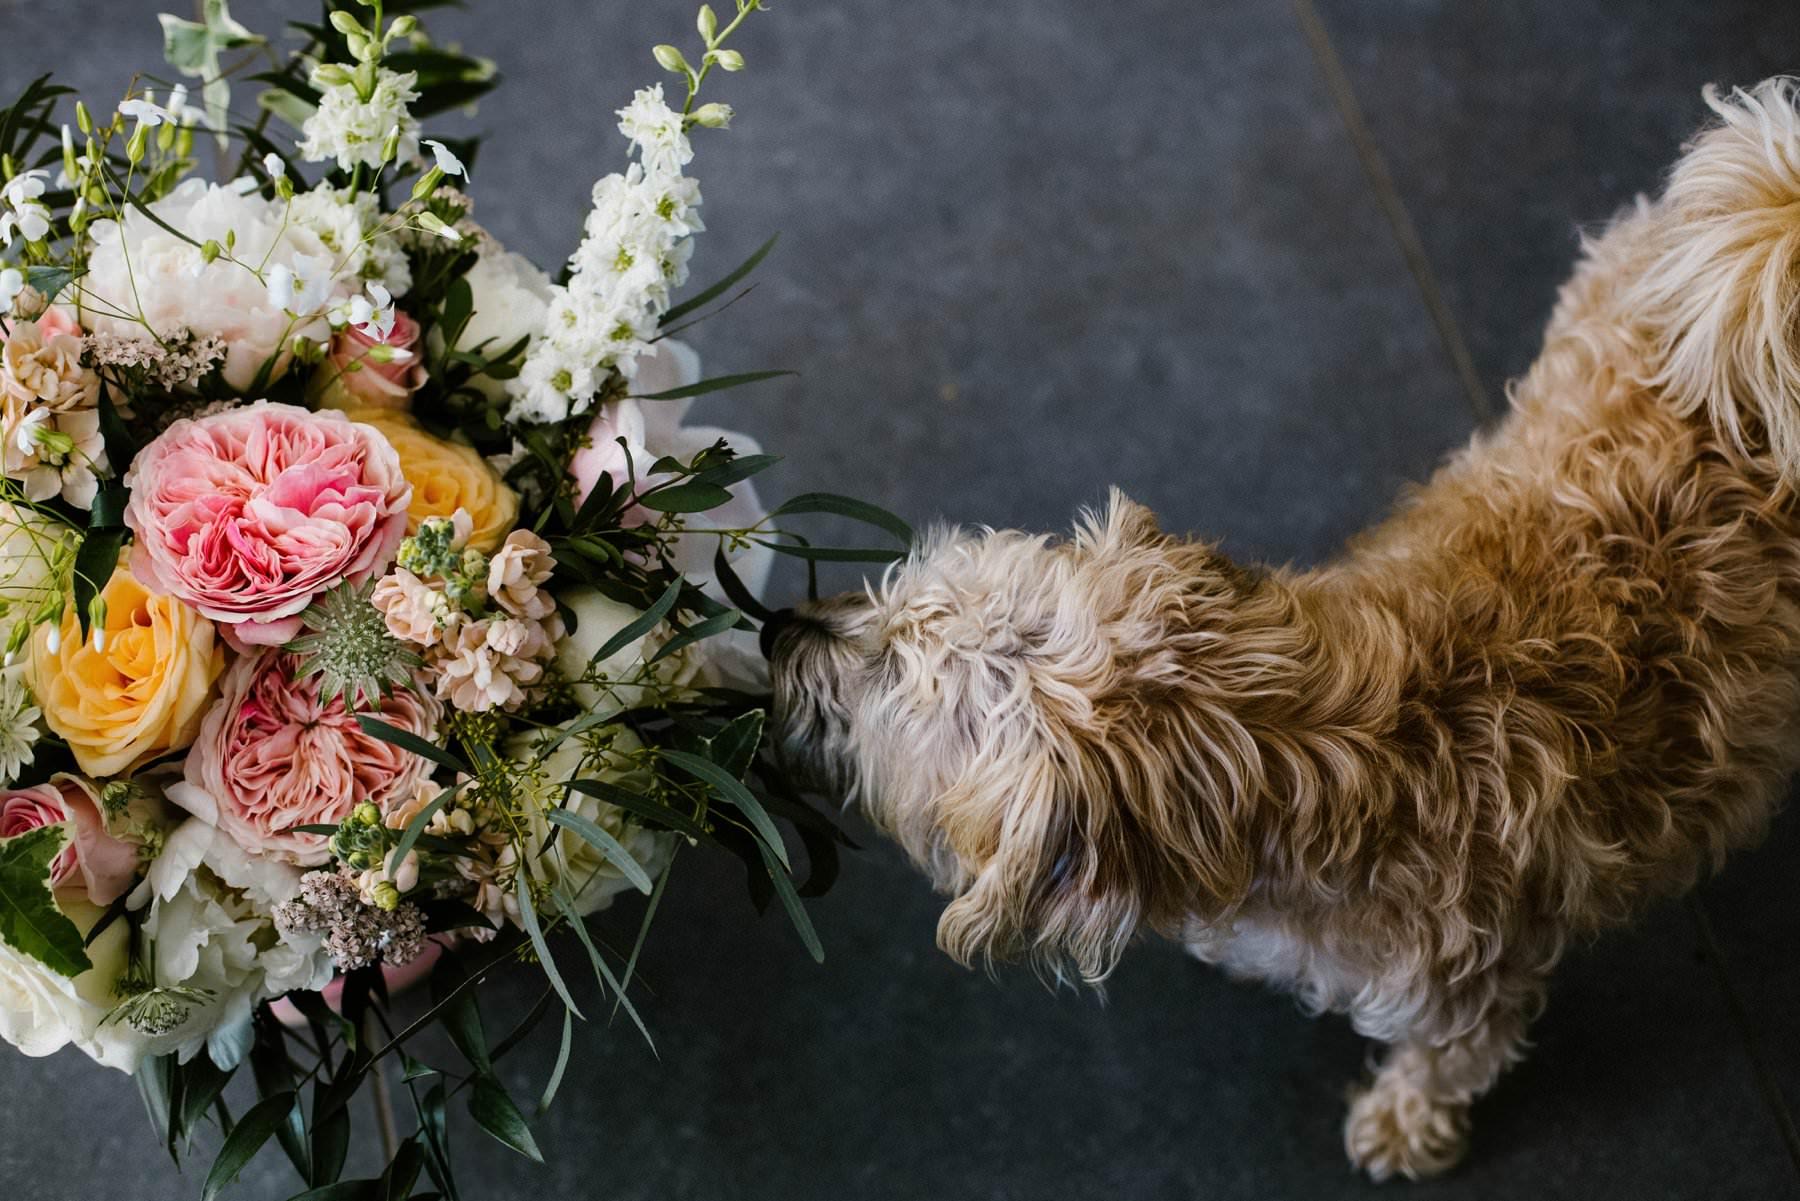 Dog smells bridal bouquet before wedding in antrim castle gardens